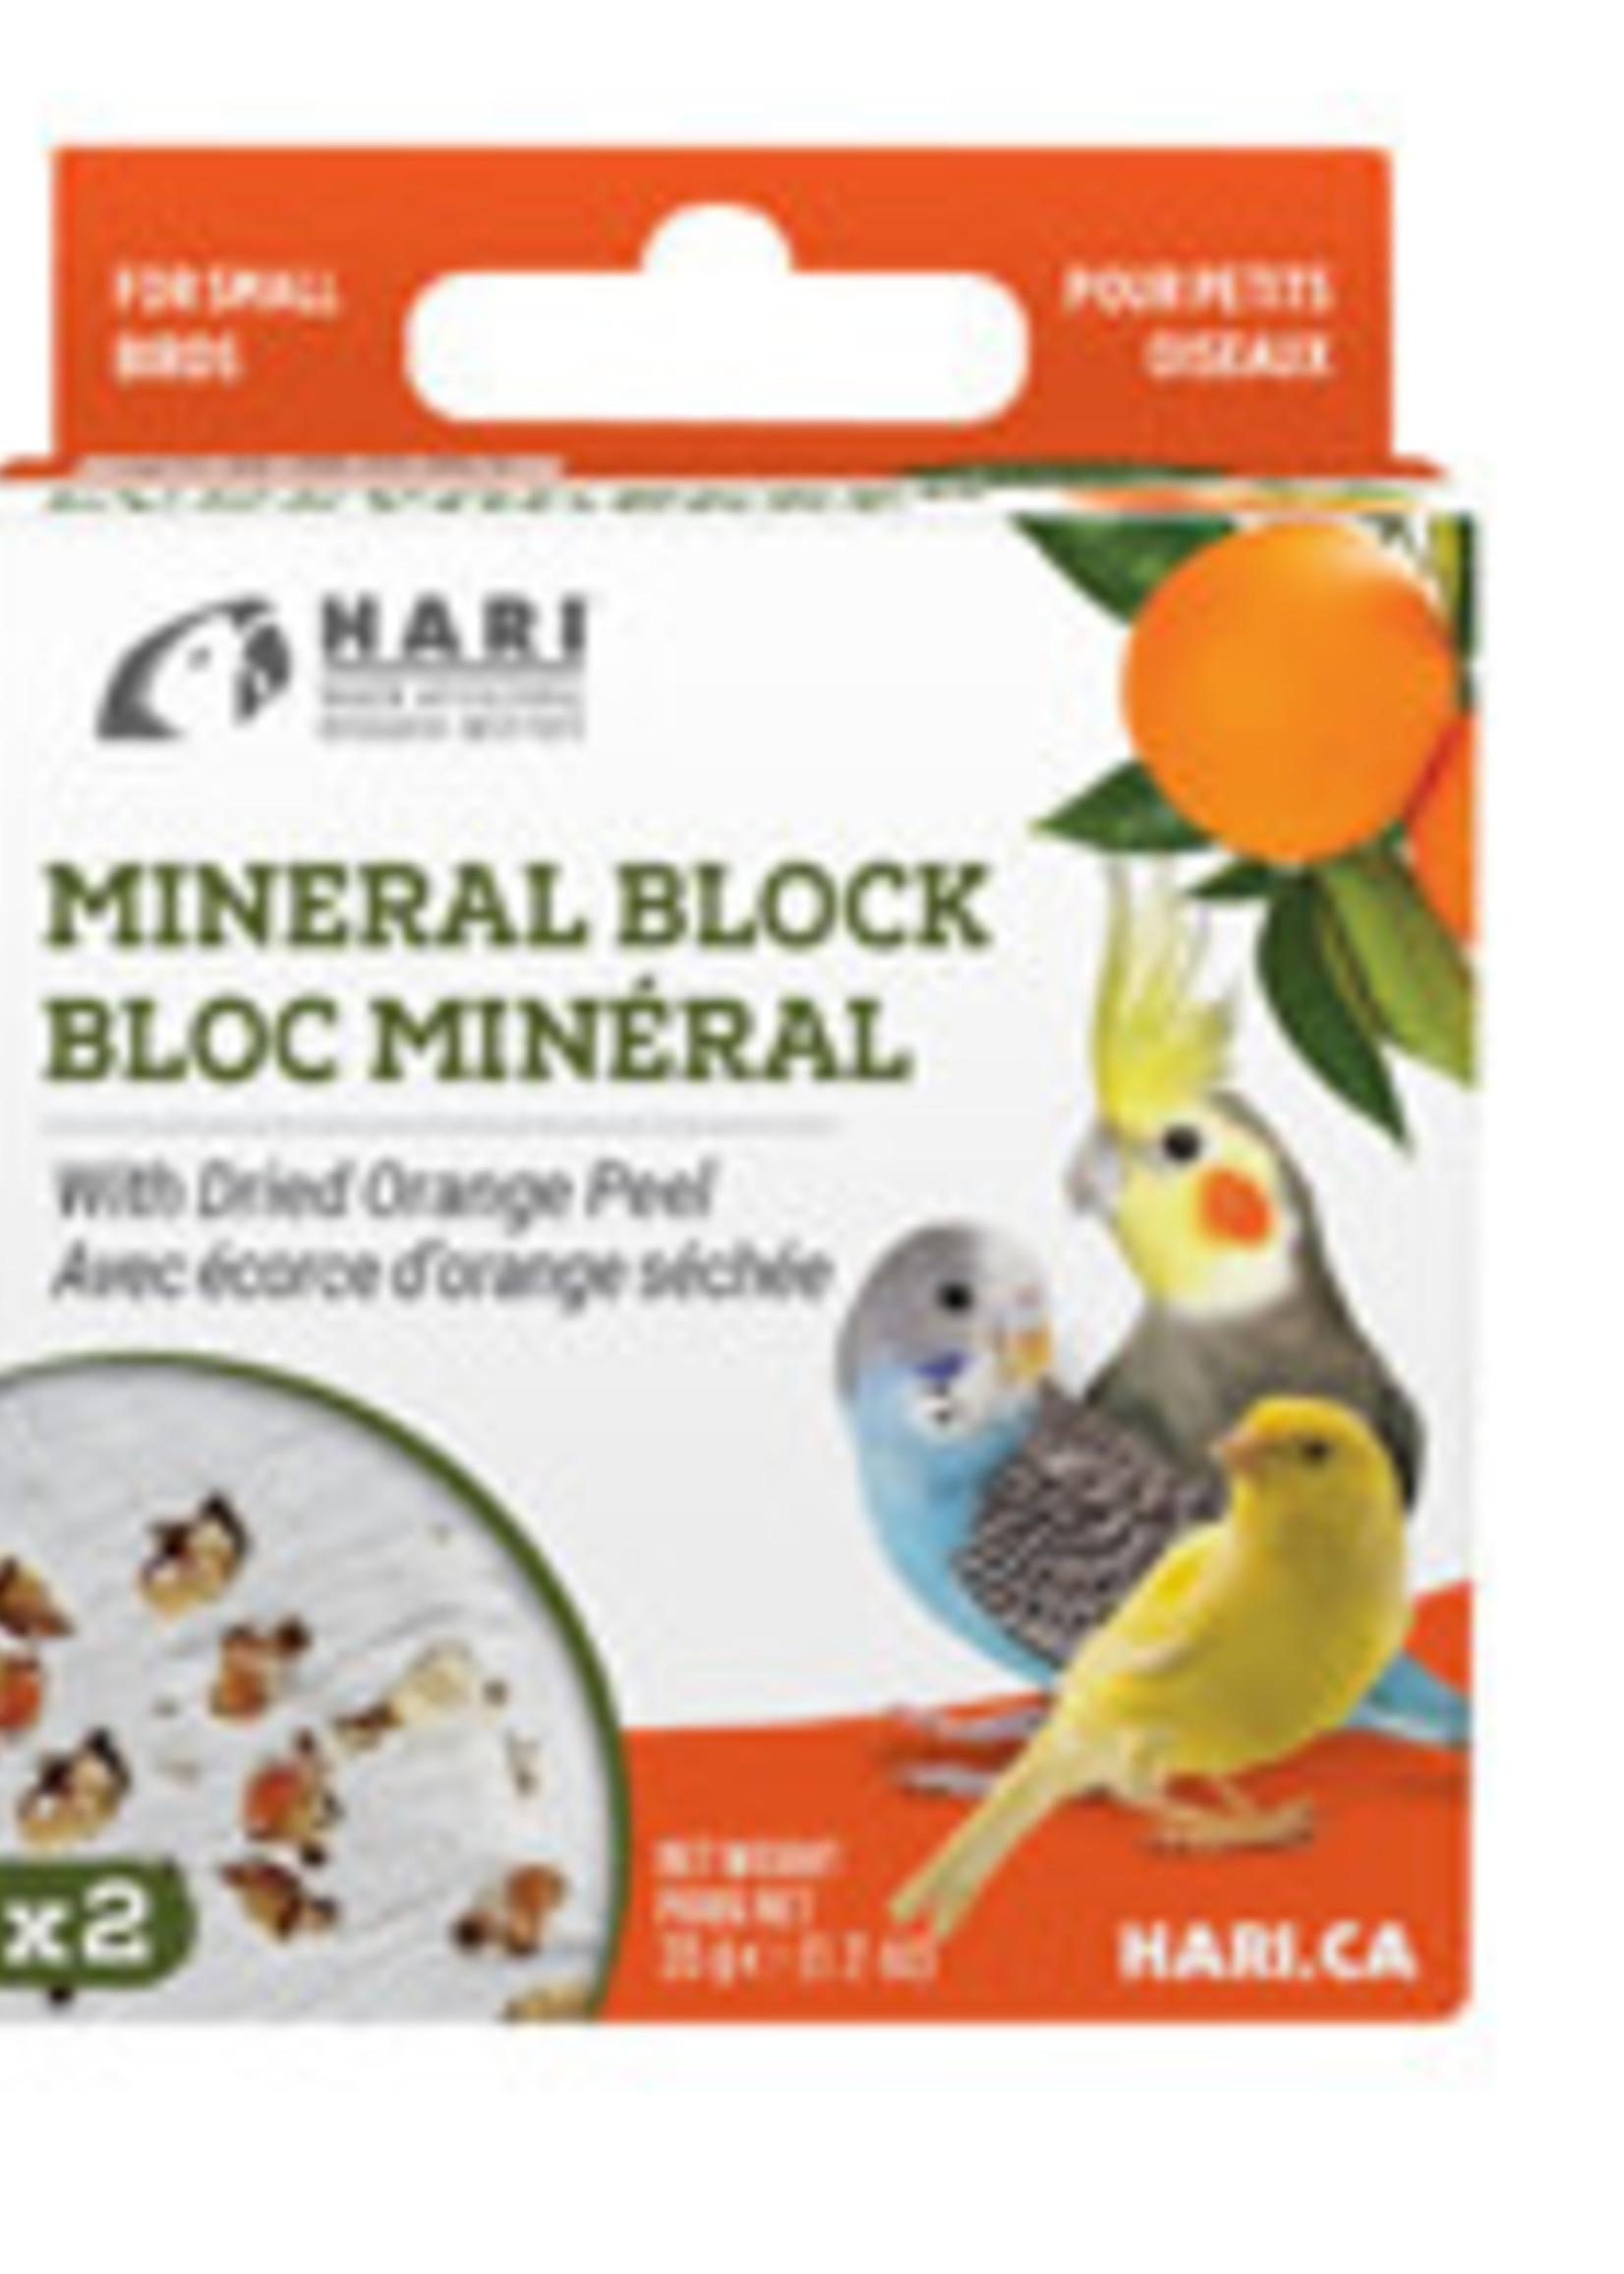 HARI Mineral Block for Small Birds - Dried Orange Peel - 35 g - 2 pack